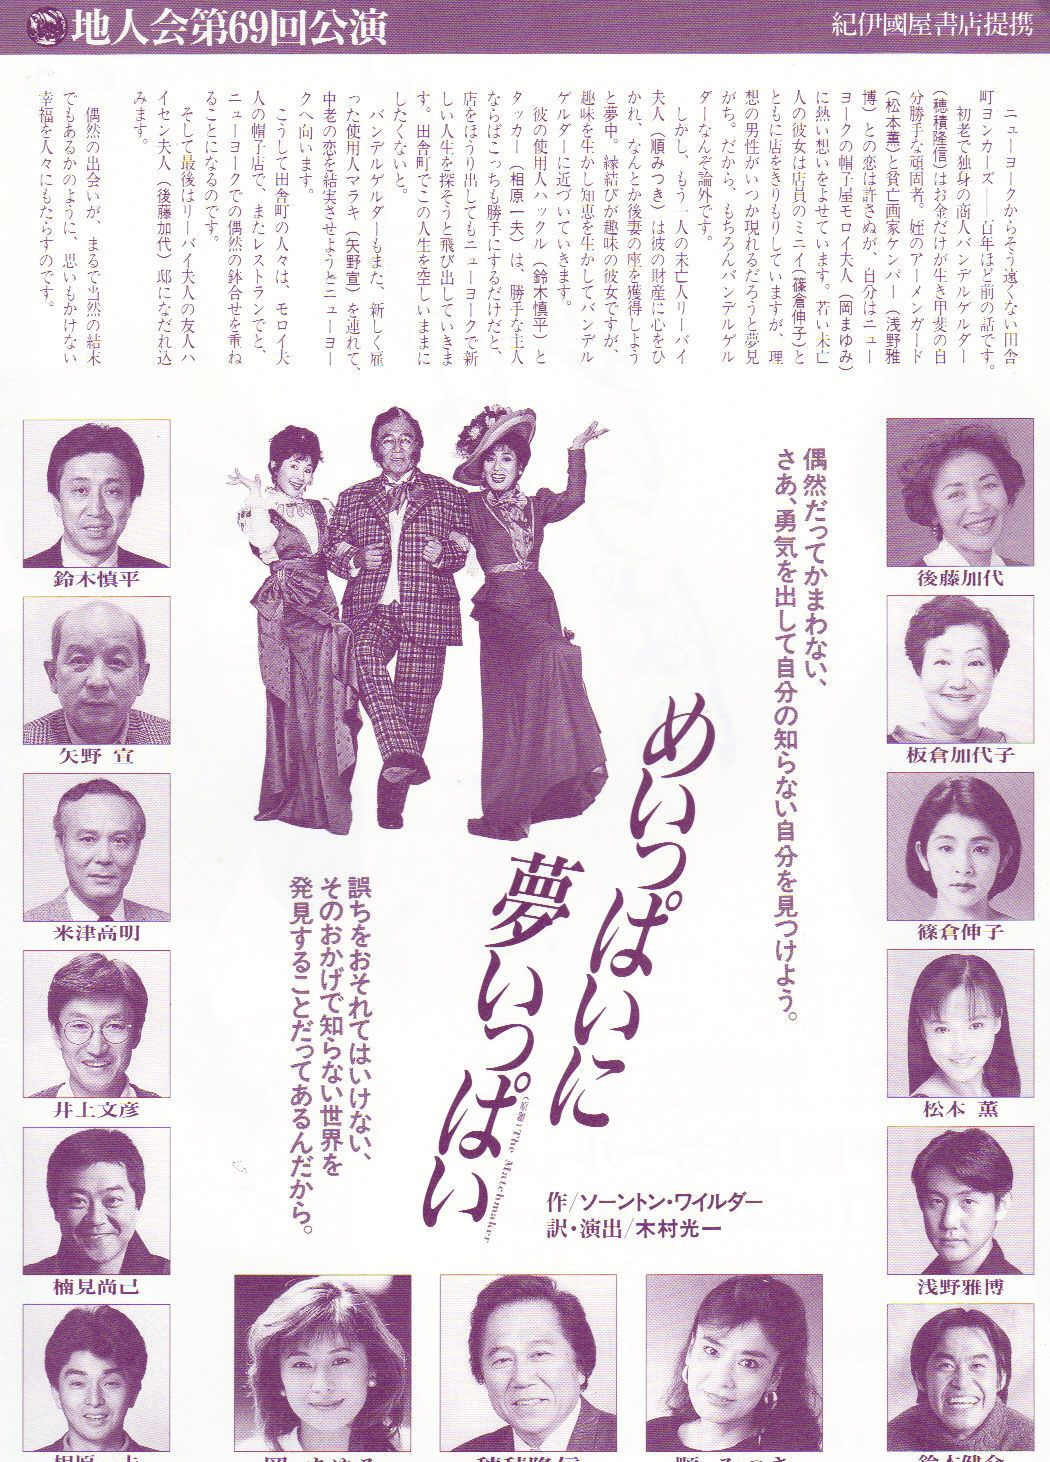 japanese-matchmaker-flyer_4362605134_o.jpg